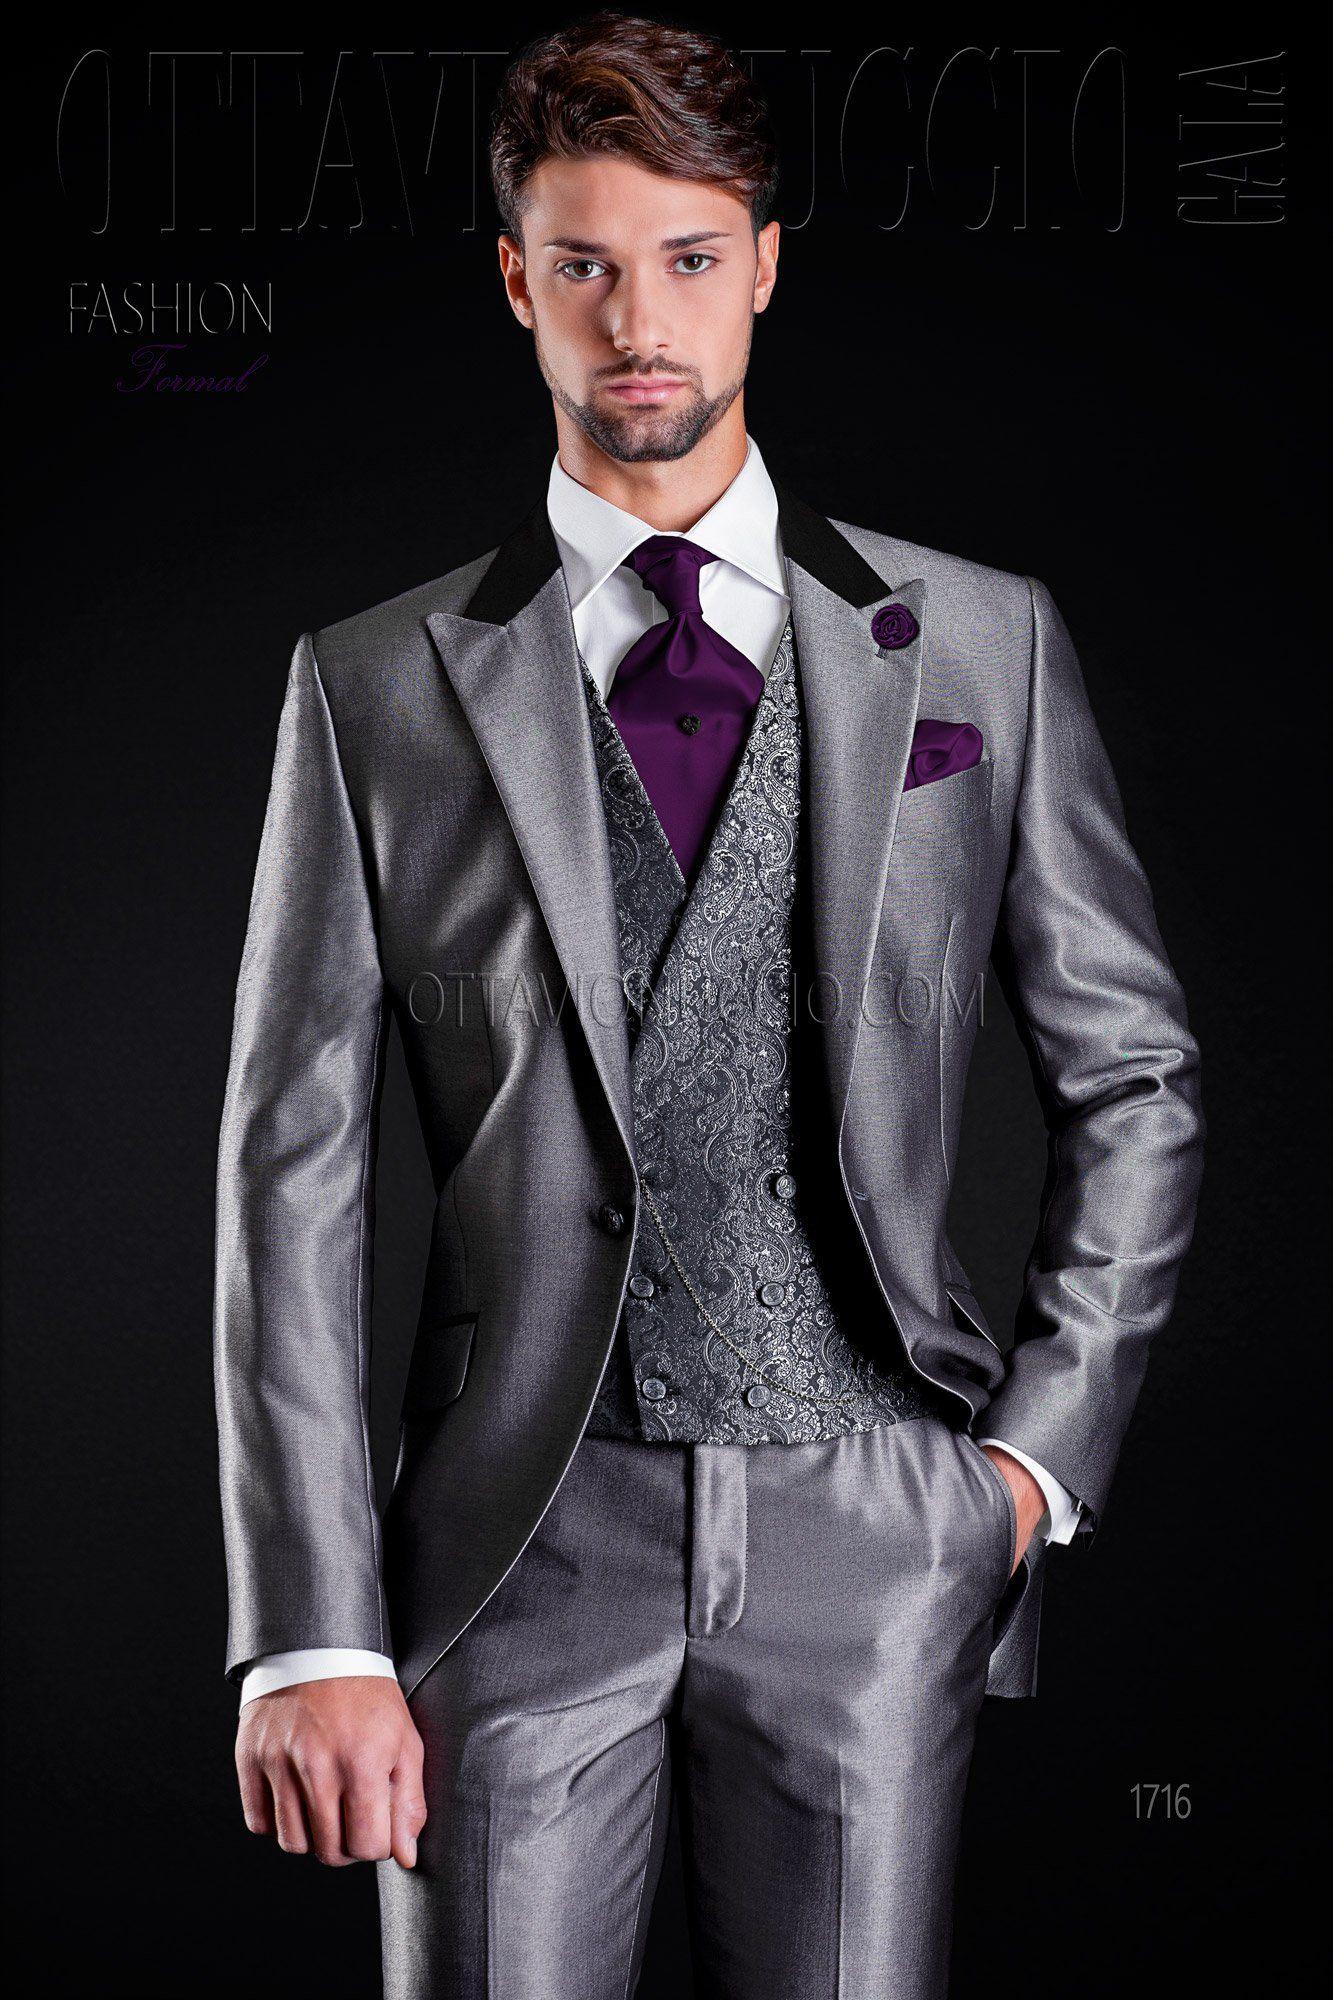 Wedding suit grey with satin collar  groom  tuxedo  luxury  menswear   dapper  menstyle  madeinitaly 2b9ebbb94864